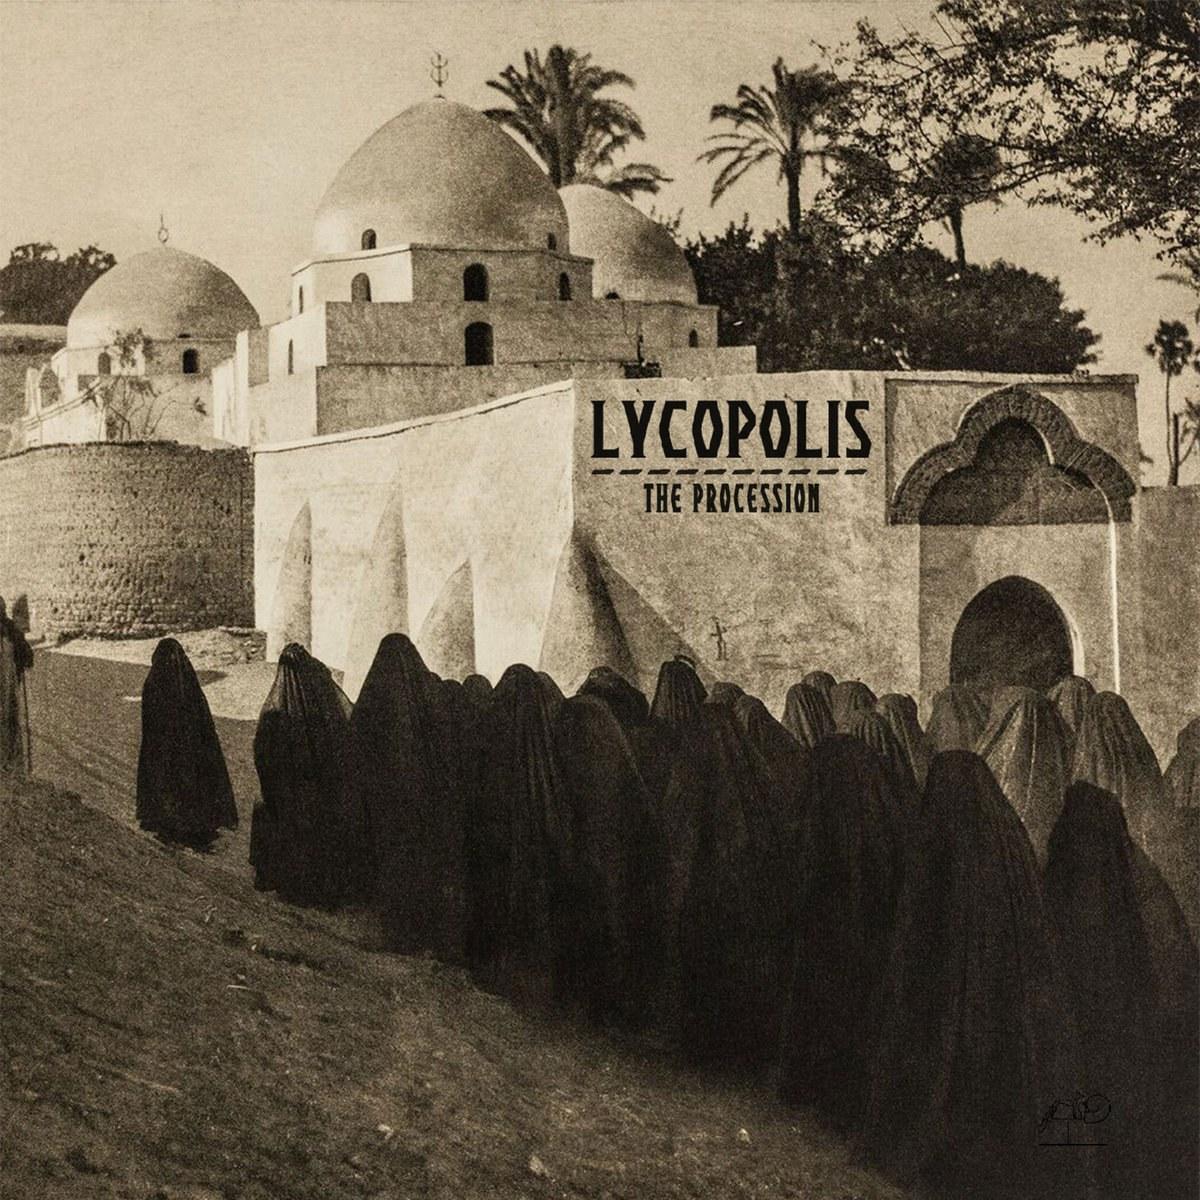 Lycopolis - The Procession